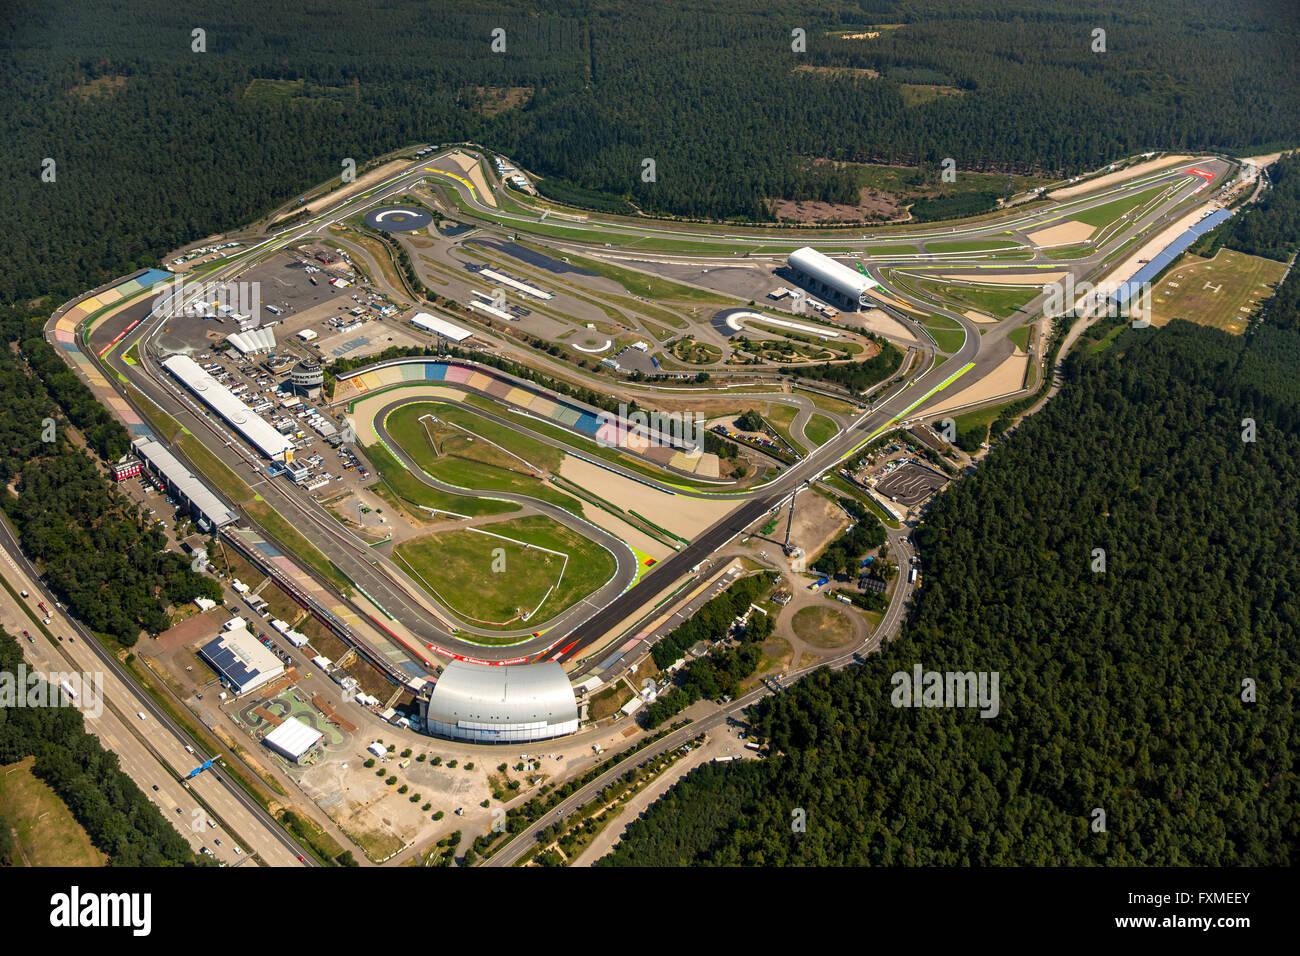 Aerial view, Hockenheimring, formerly Hockenheimring, Kurpfalzring, Motor Racing, DTM track, Germany, Europe, Aerial - Stock Image